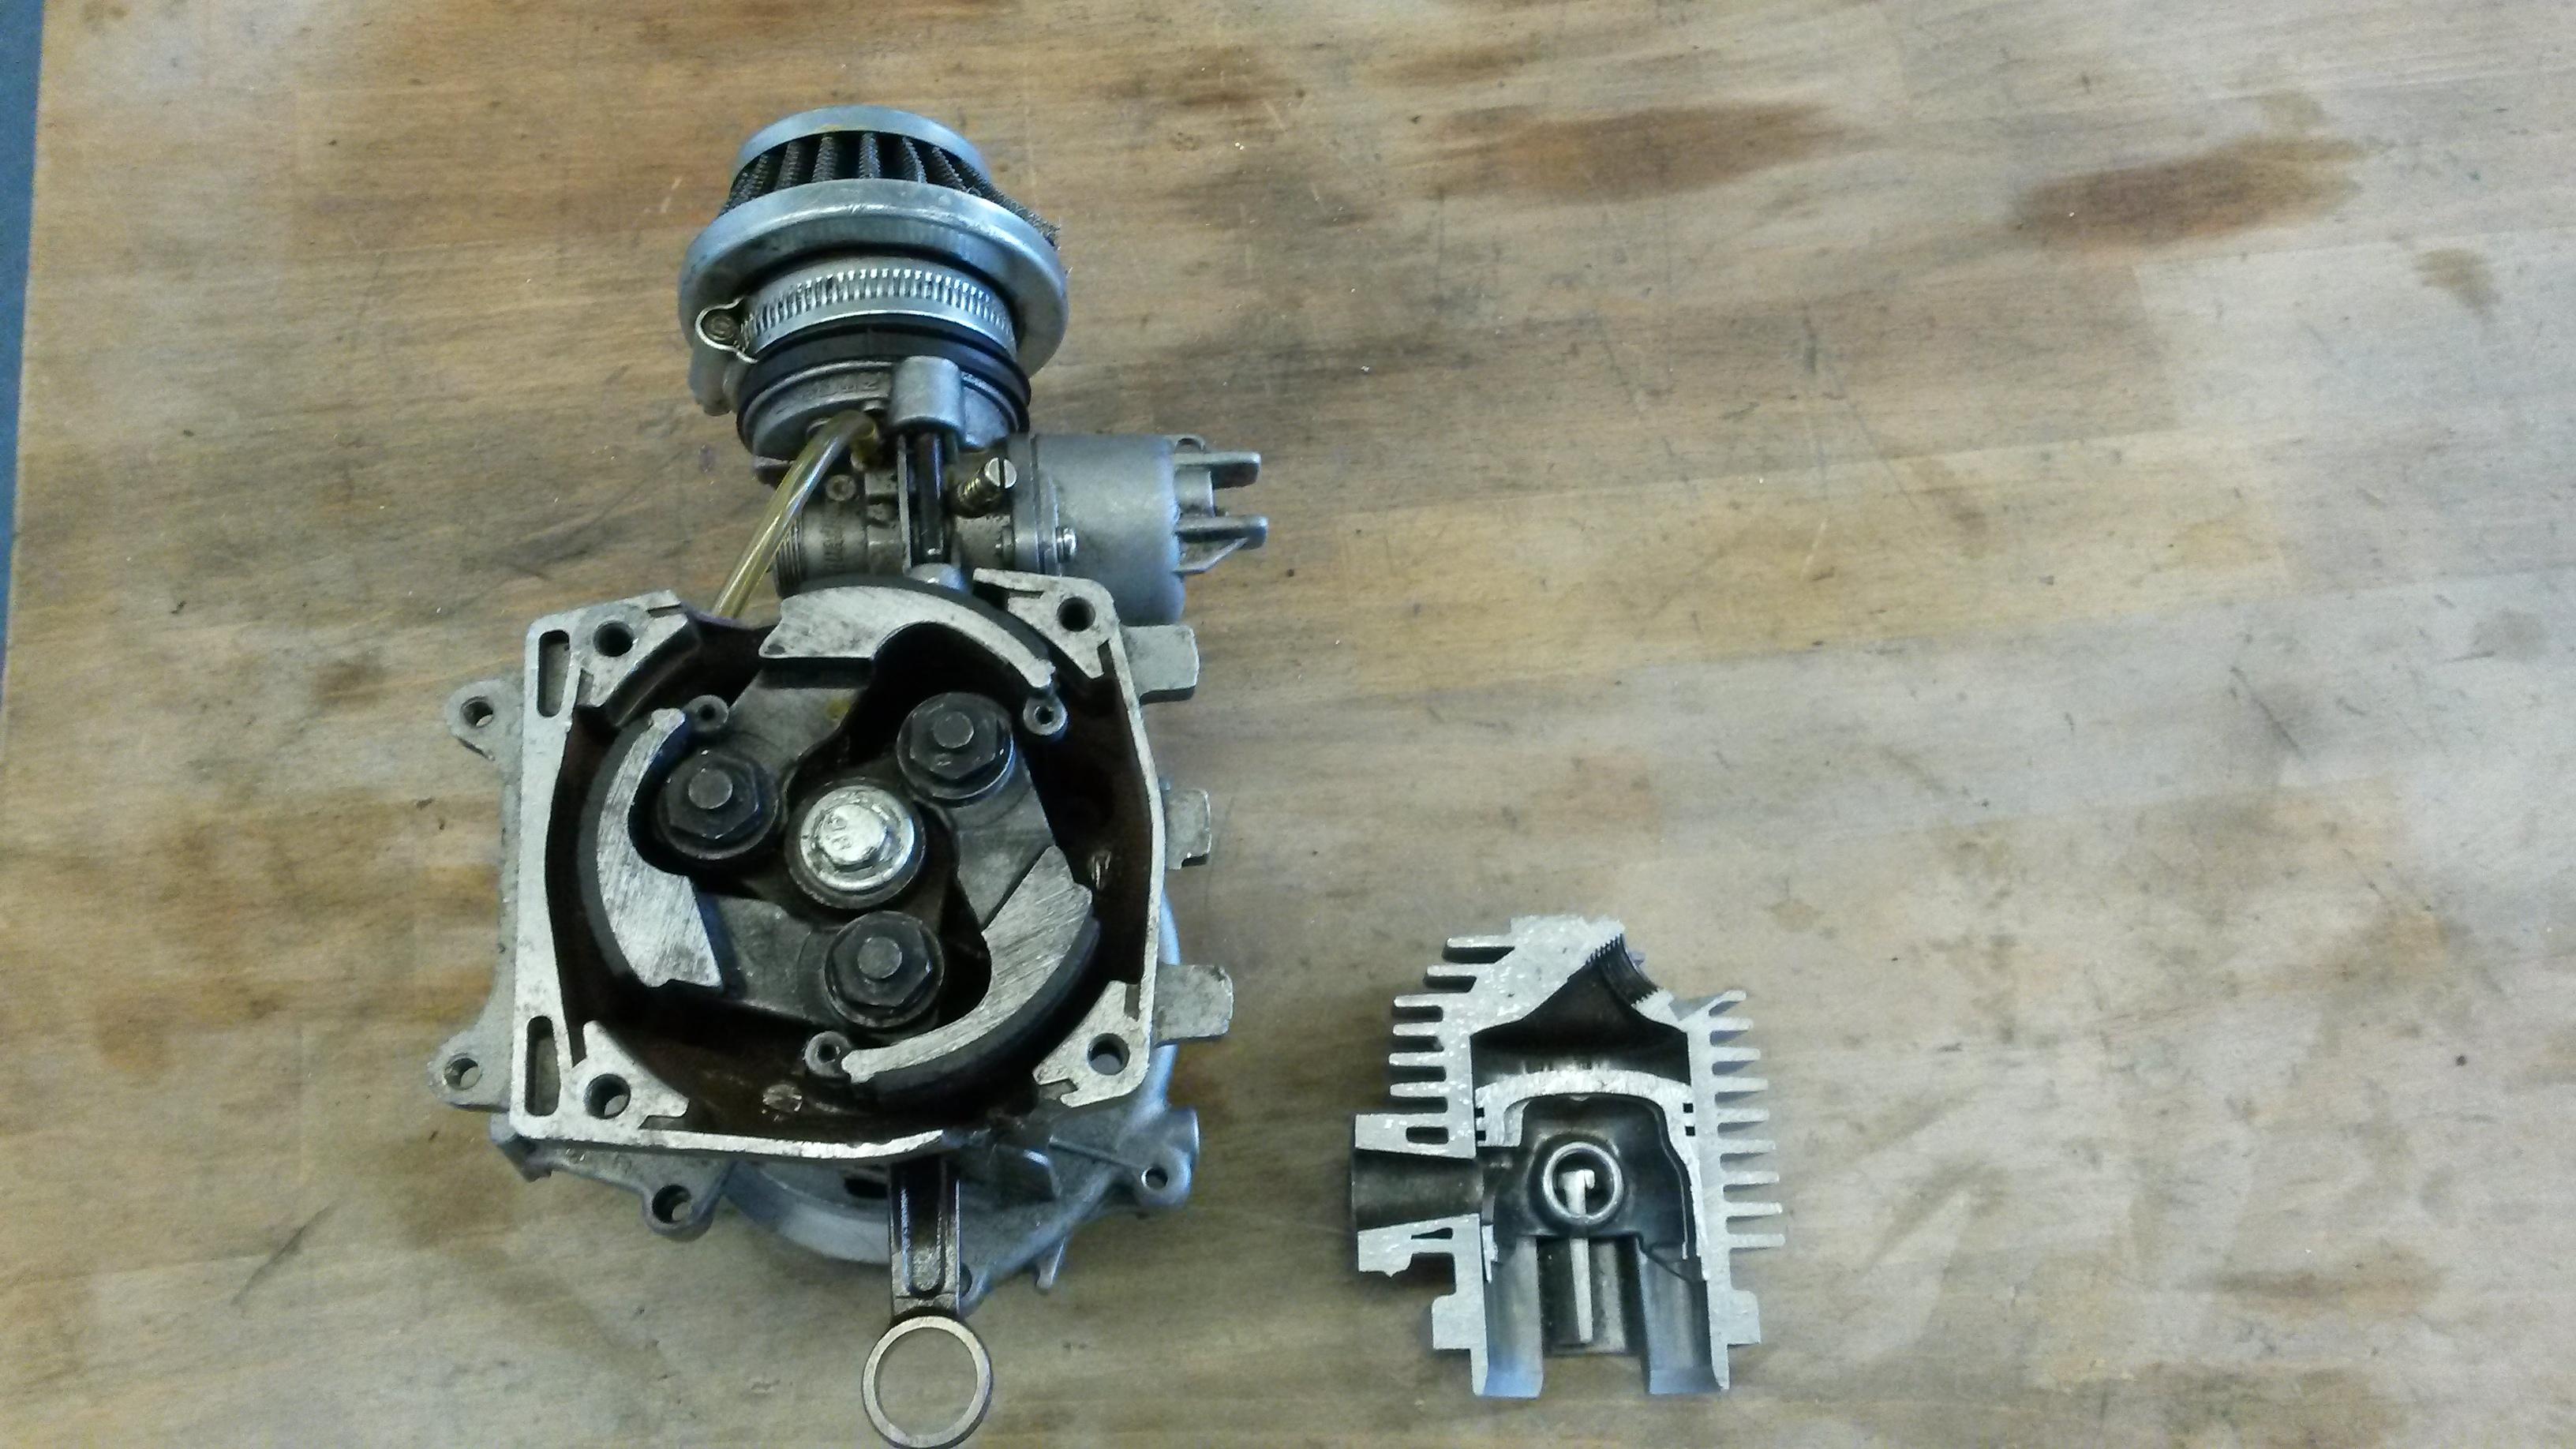 Motor2